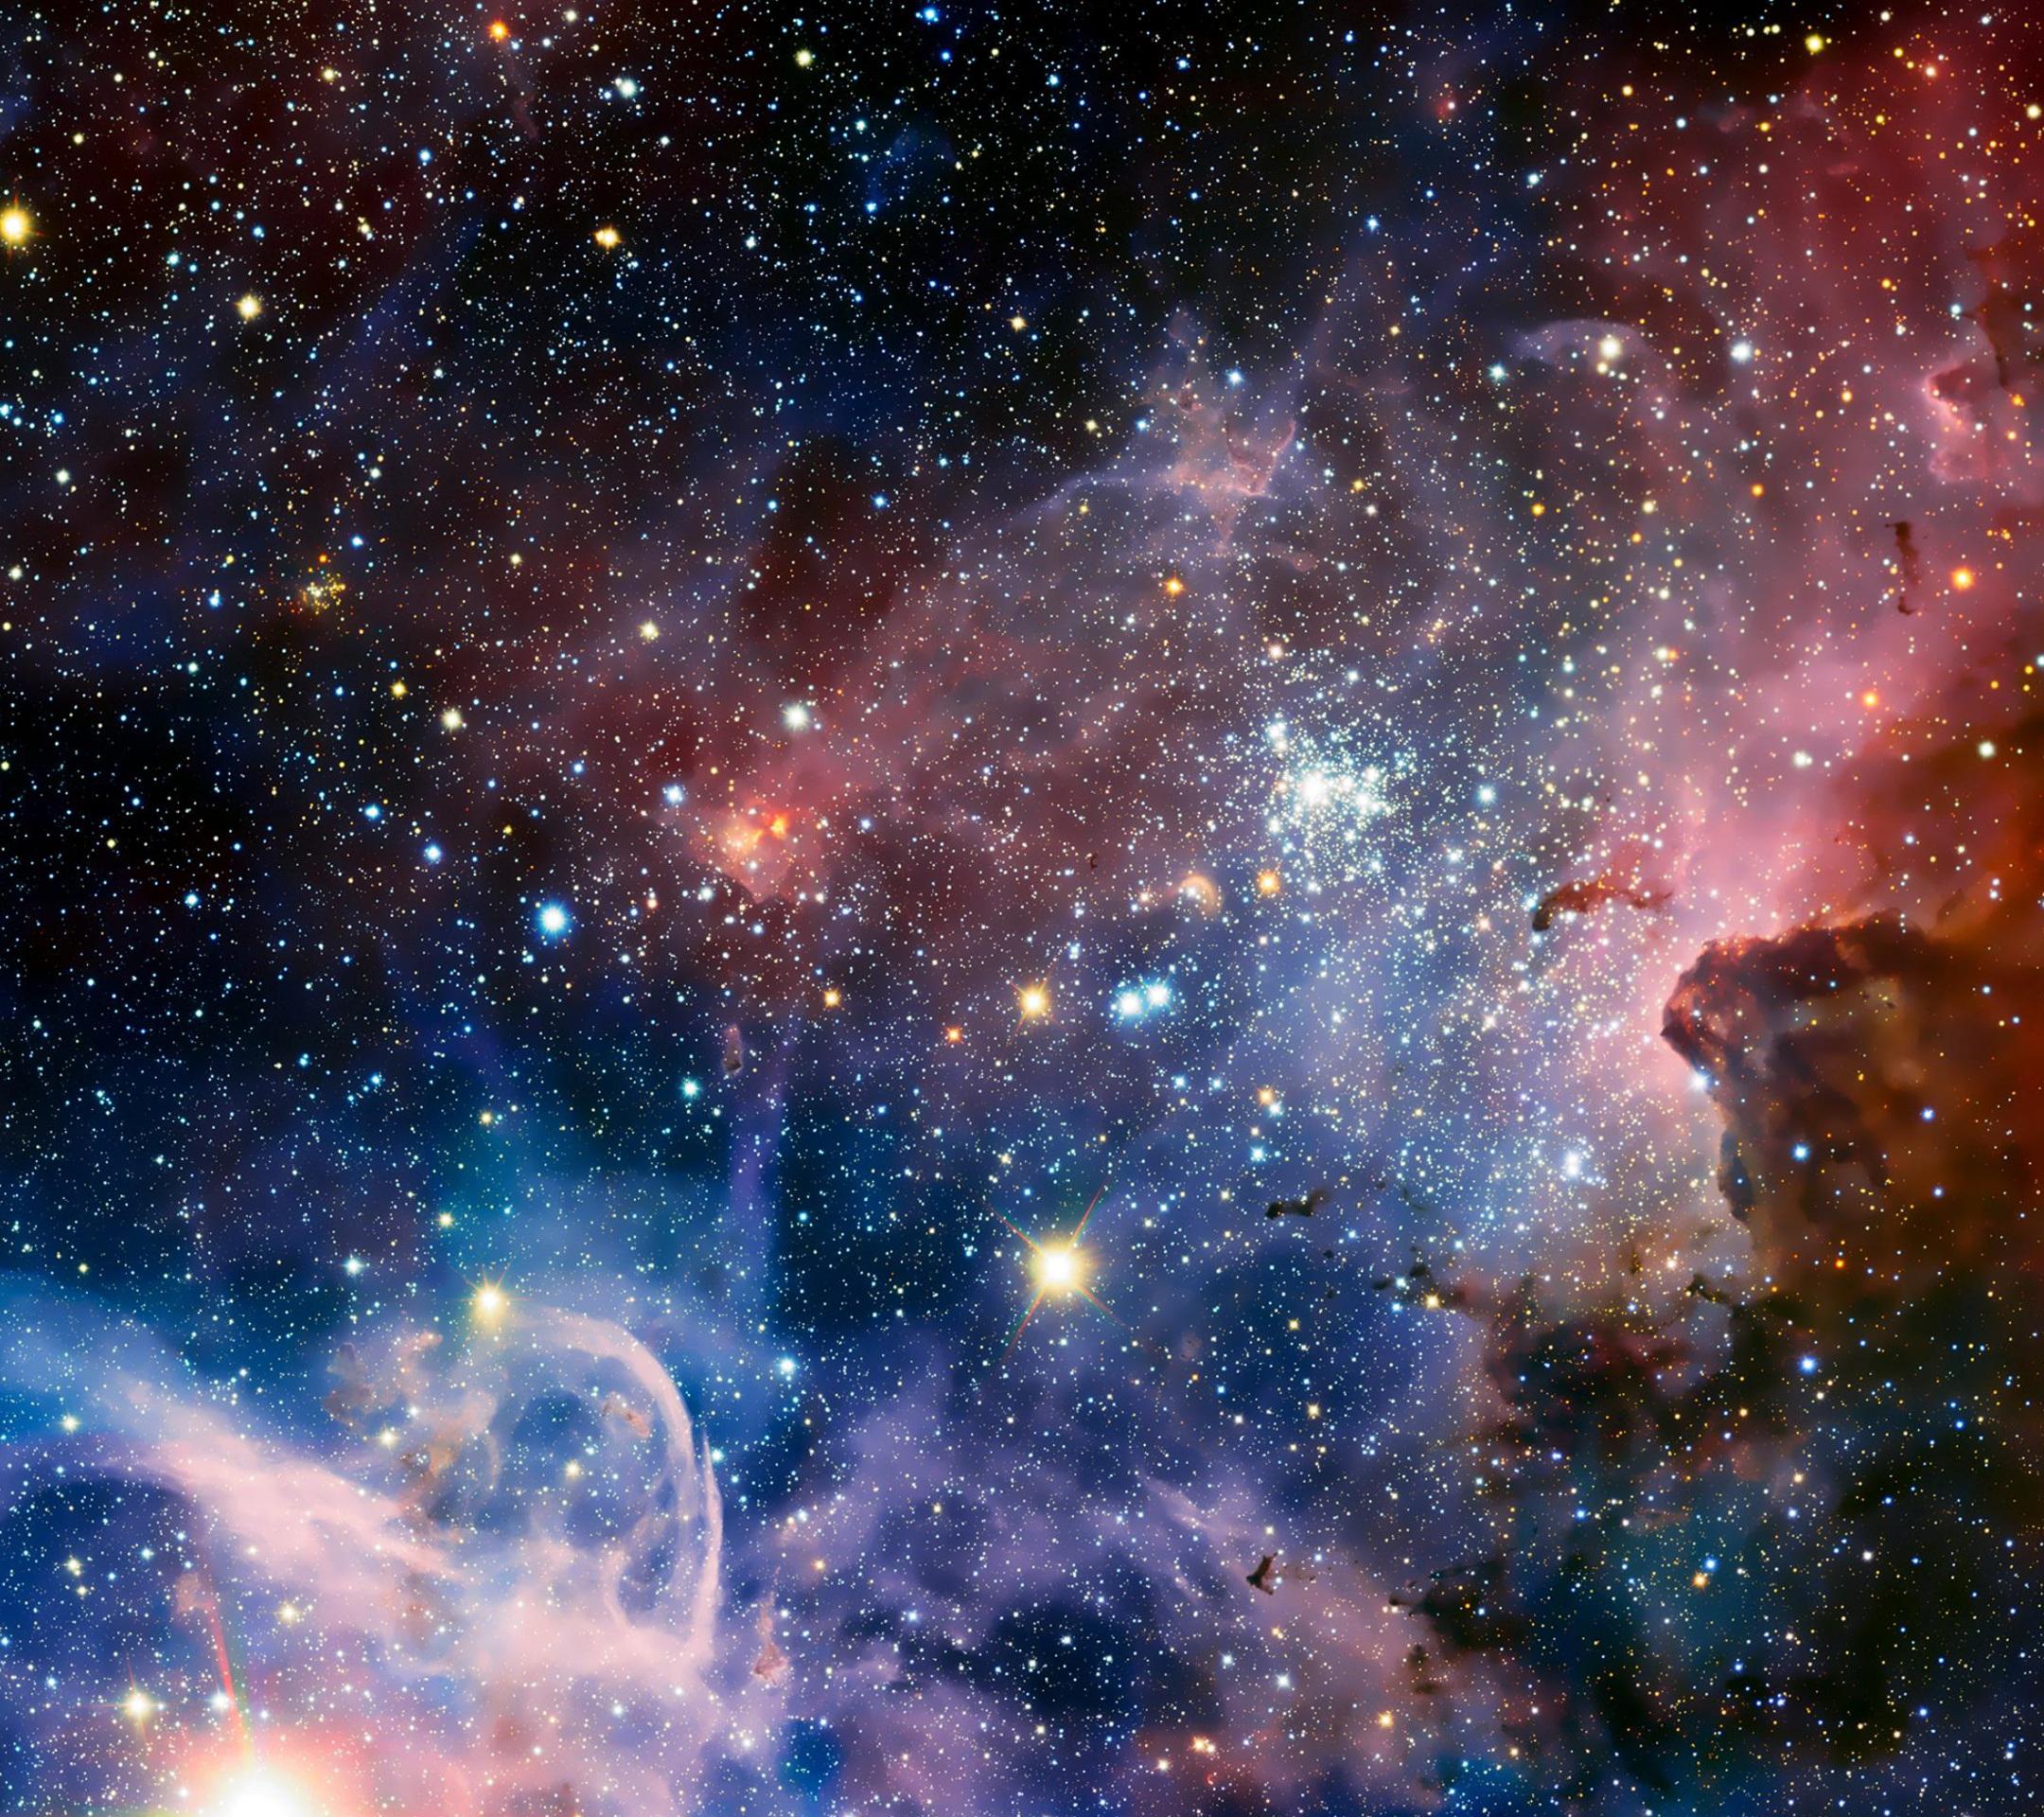 Nebula HD Wallpaper   Samsung Galaxy S5 HD Wallpapers 2160x1920